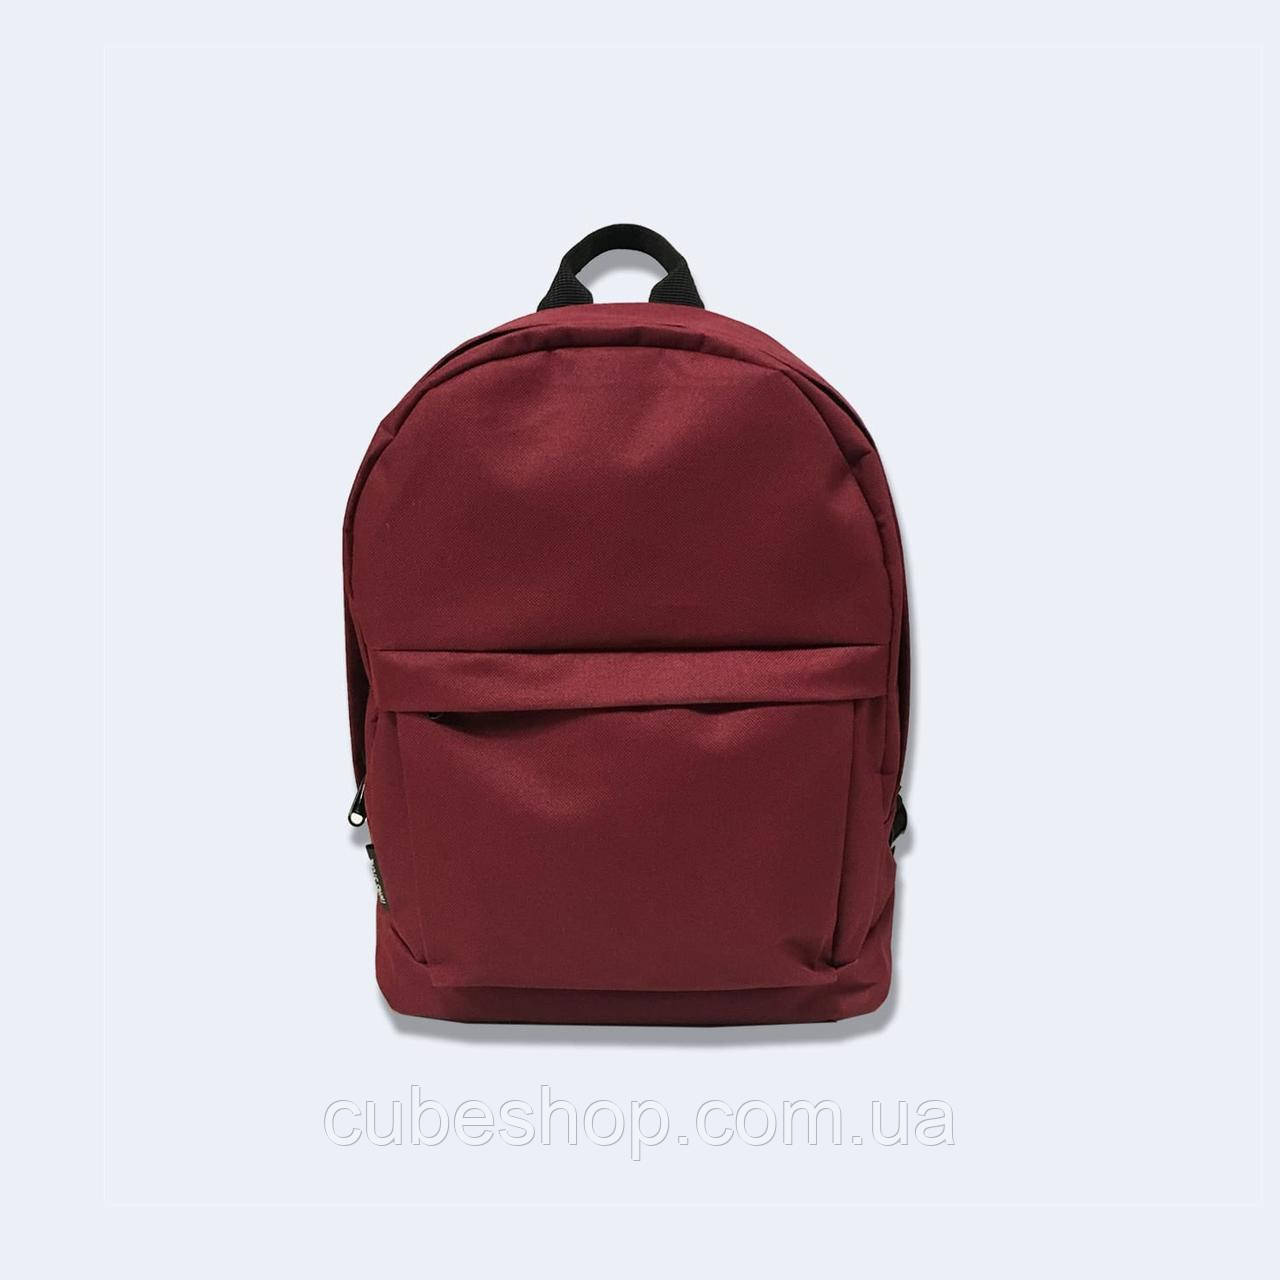 Бордовый рюкзак mini